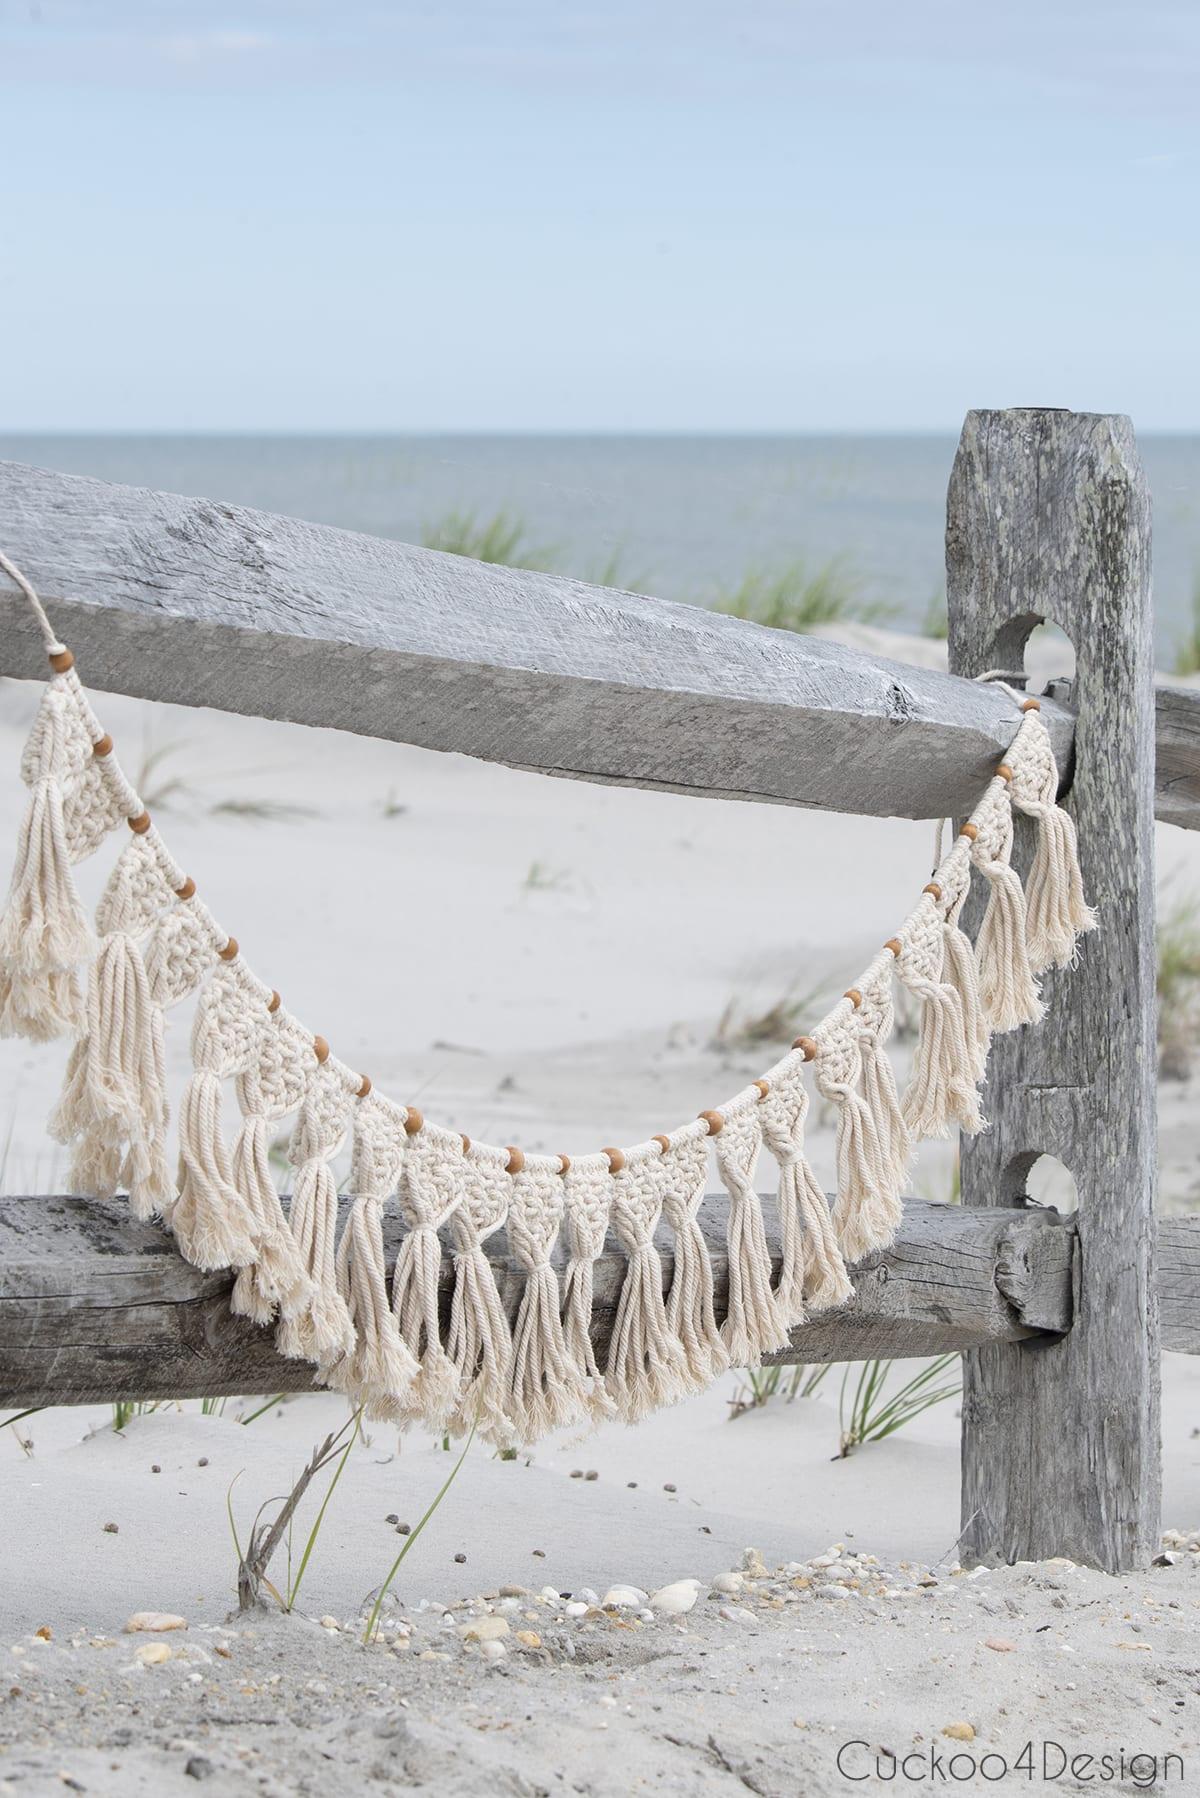 DIY macrame garland hanging on the beach